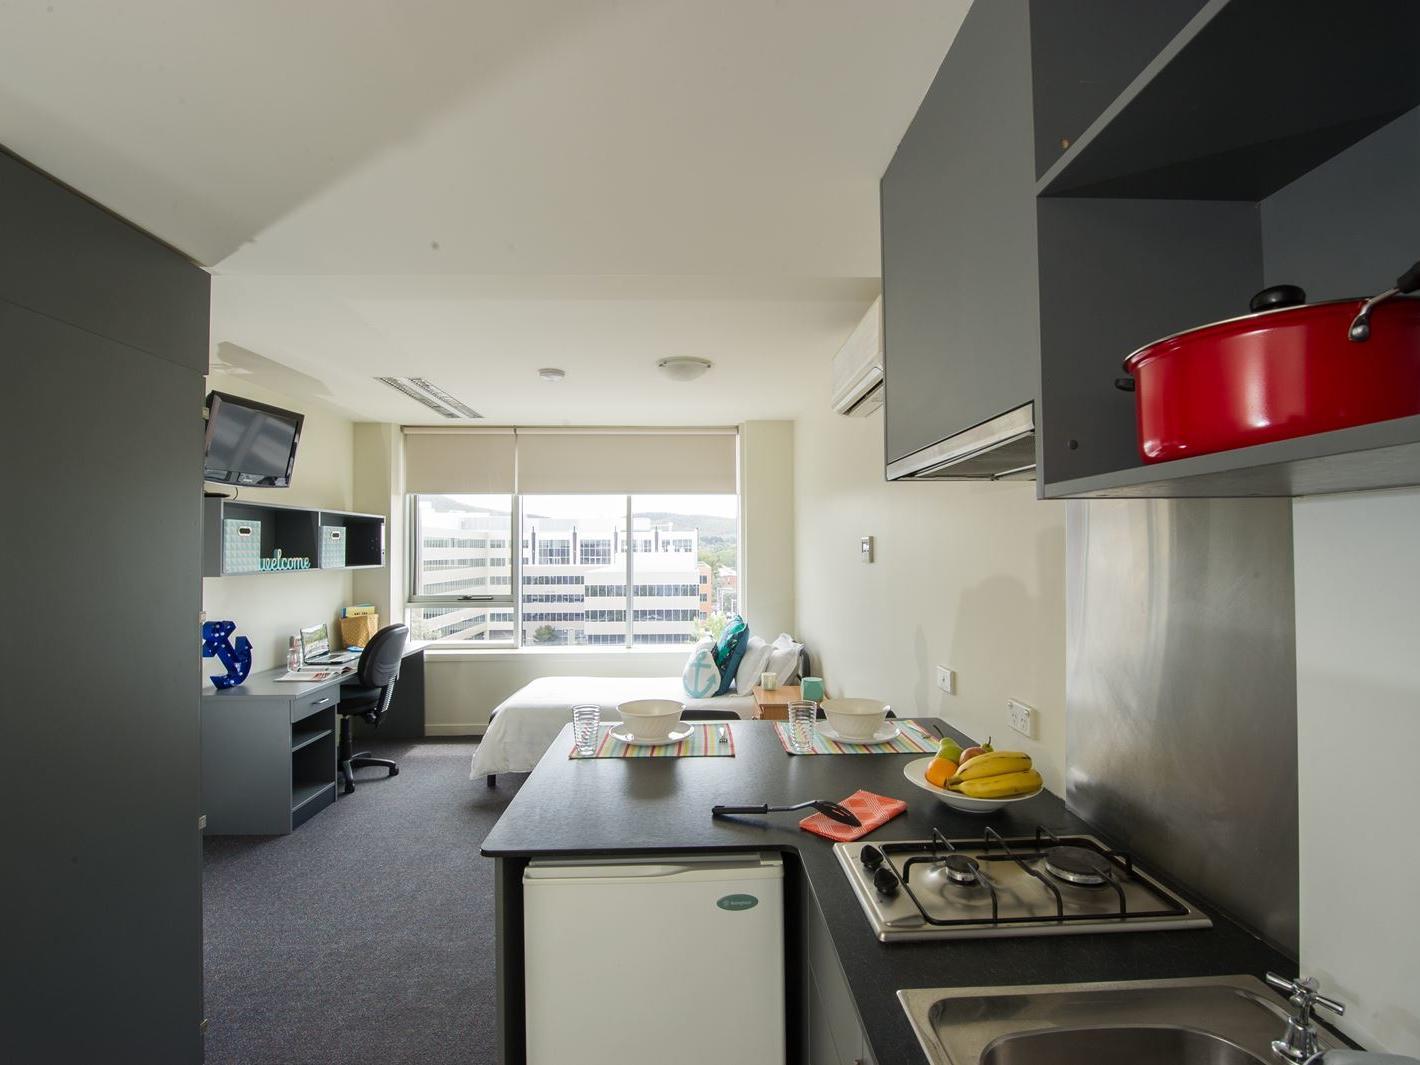 UniLodge Academie House_Studio Apartment_Students Accommodation